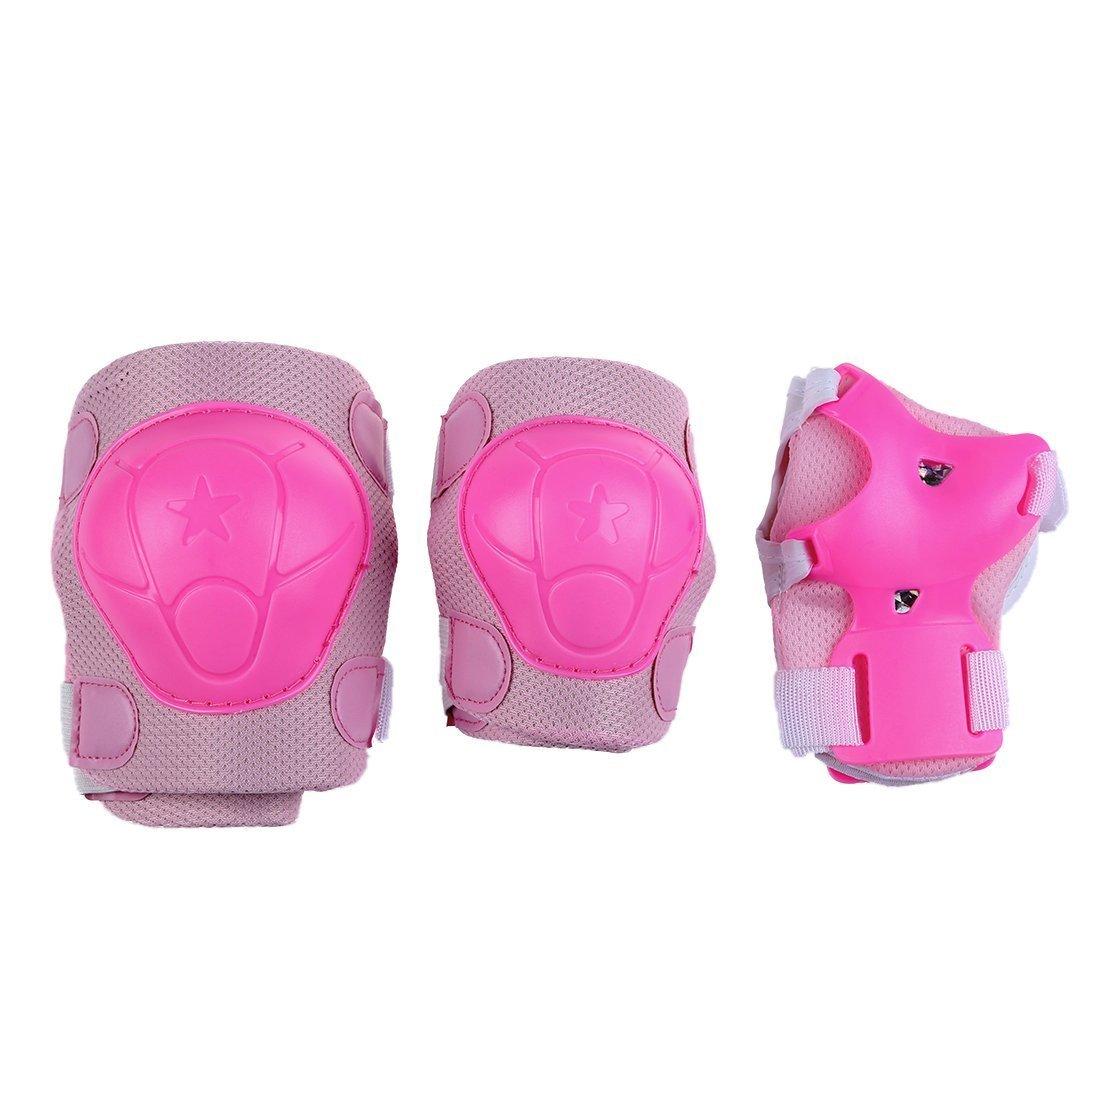 SODIAL(R) Cojines Protector para Rodilla Codo Muneca para Ninos - Rosa Claro H&PC-37960